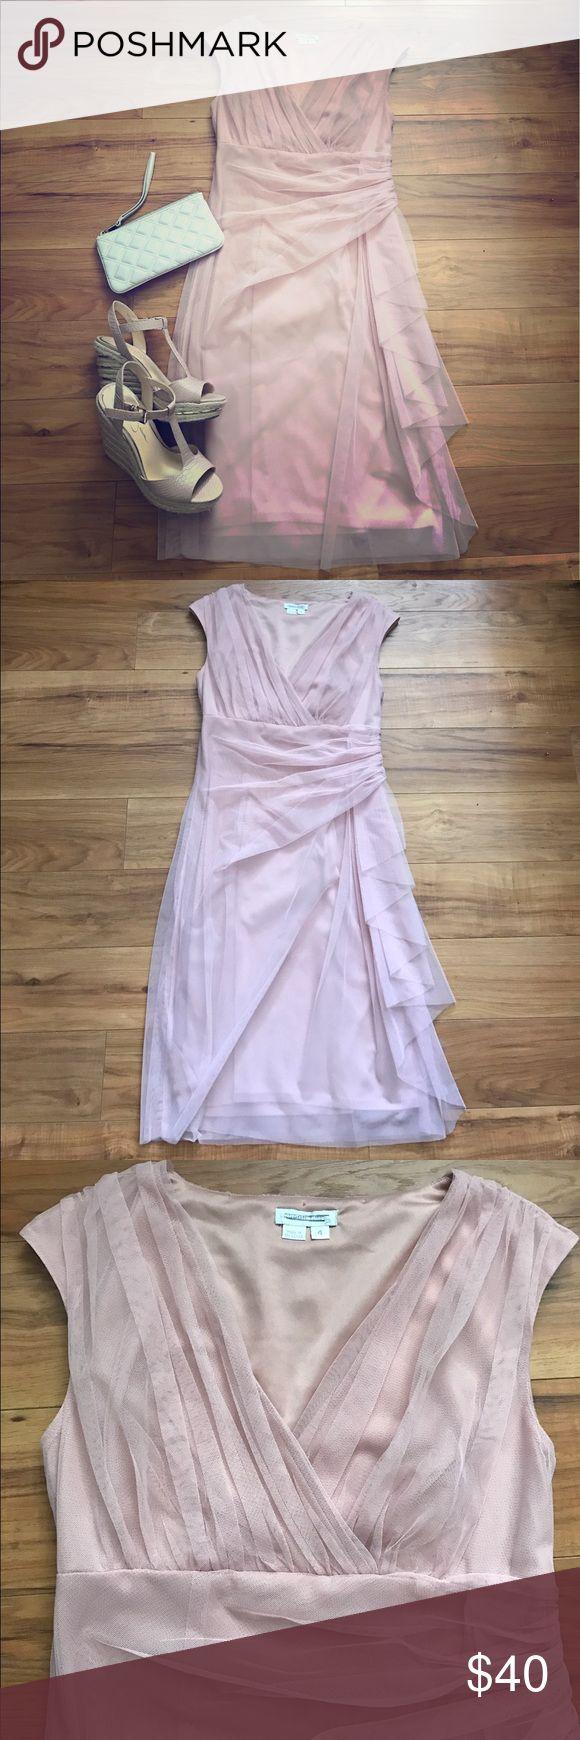 Best 25 dusty pink dresses ideas on pinterest for Pre worn wedding dresses